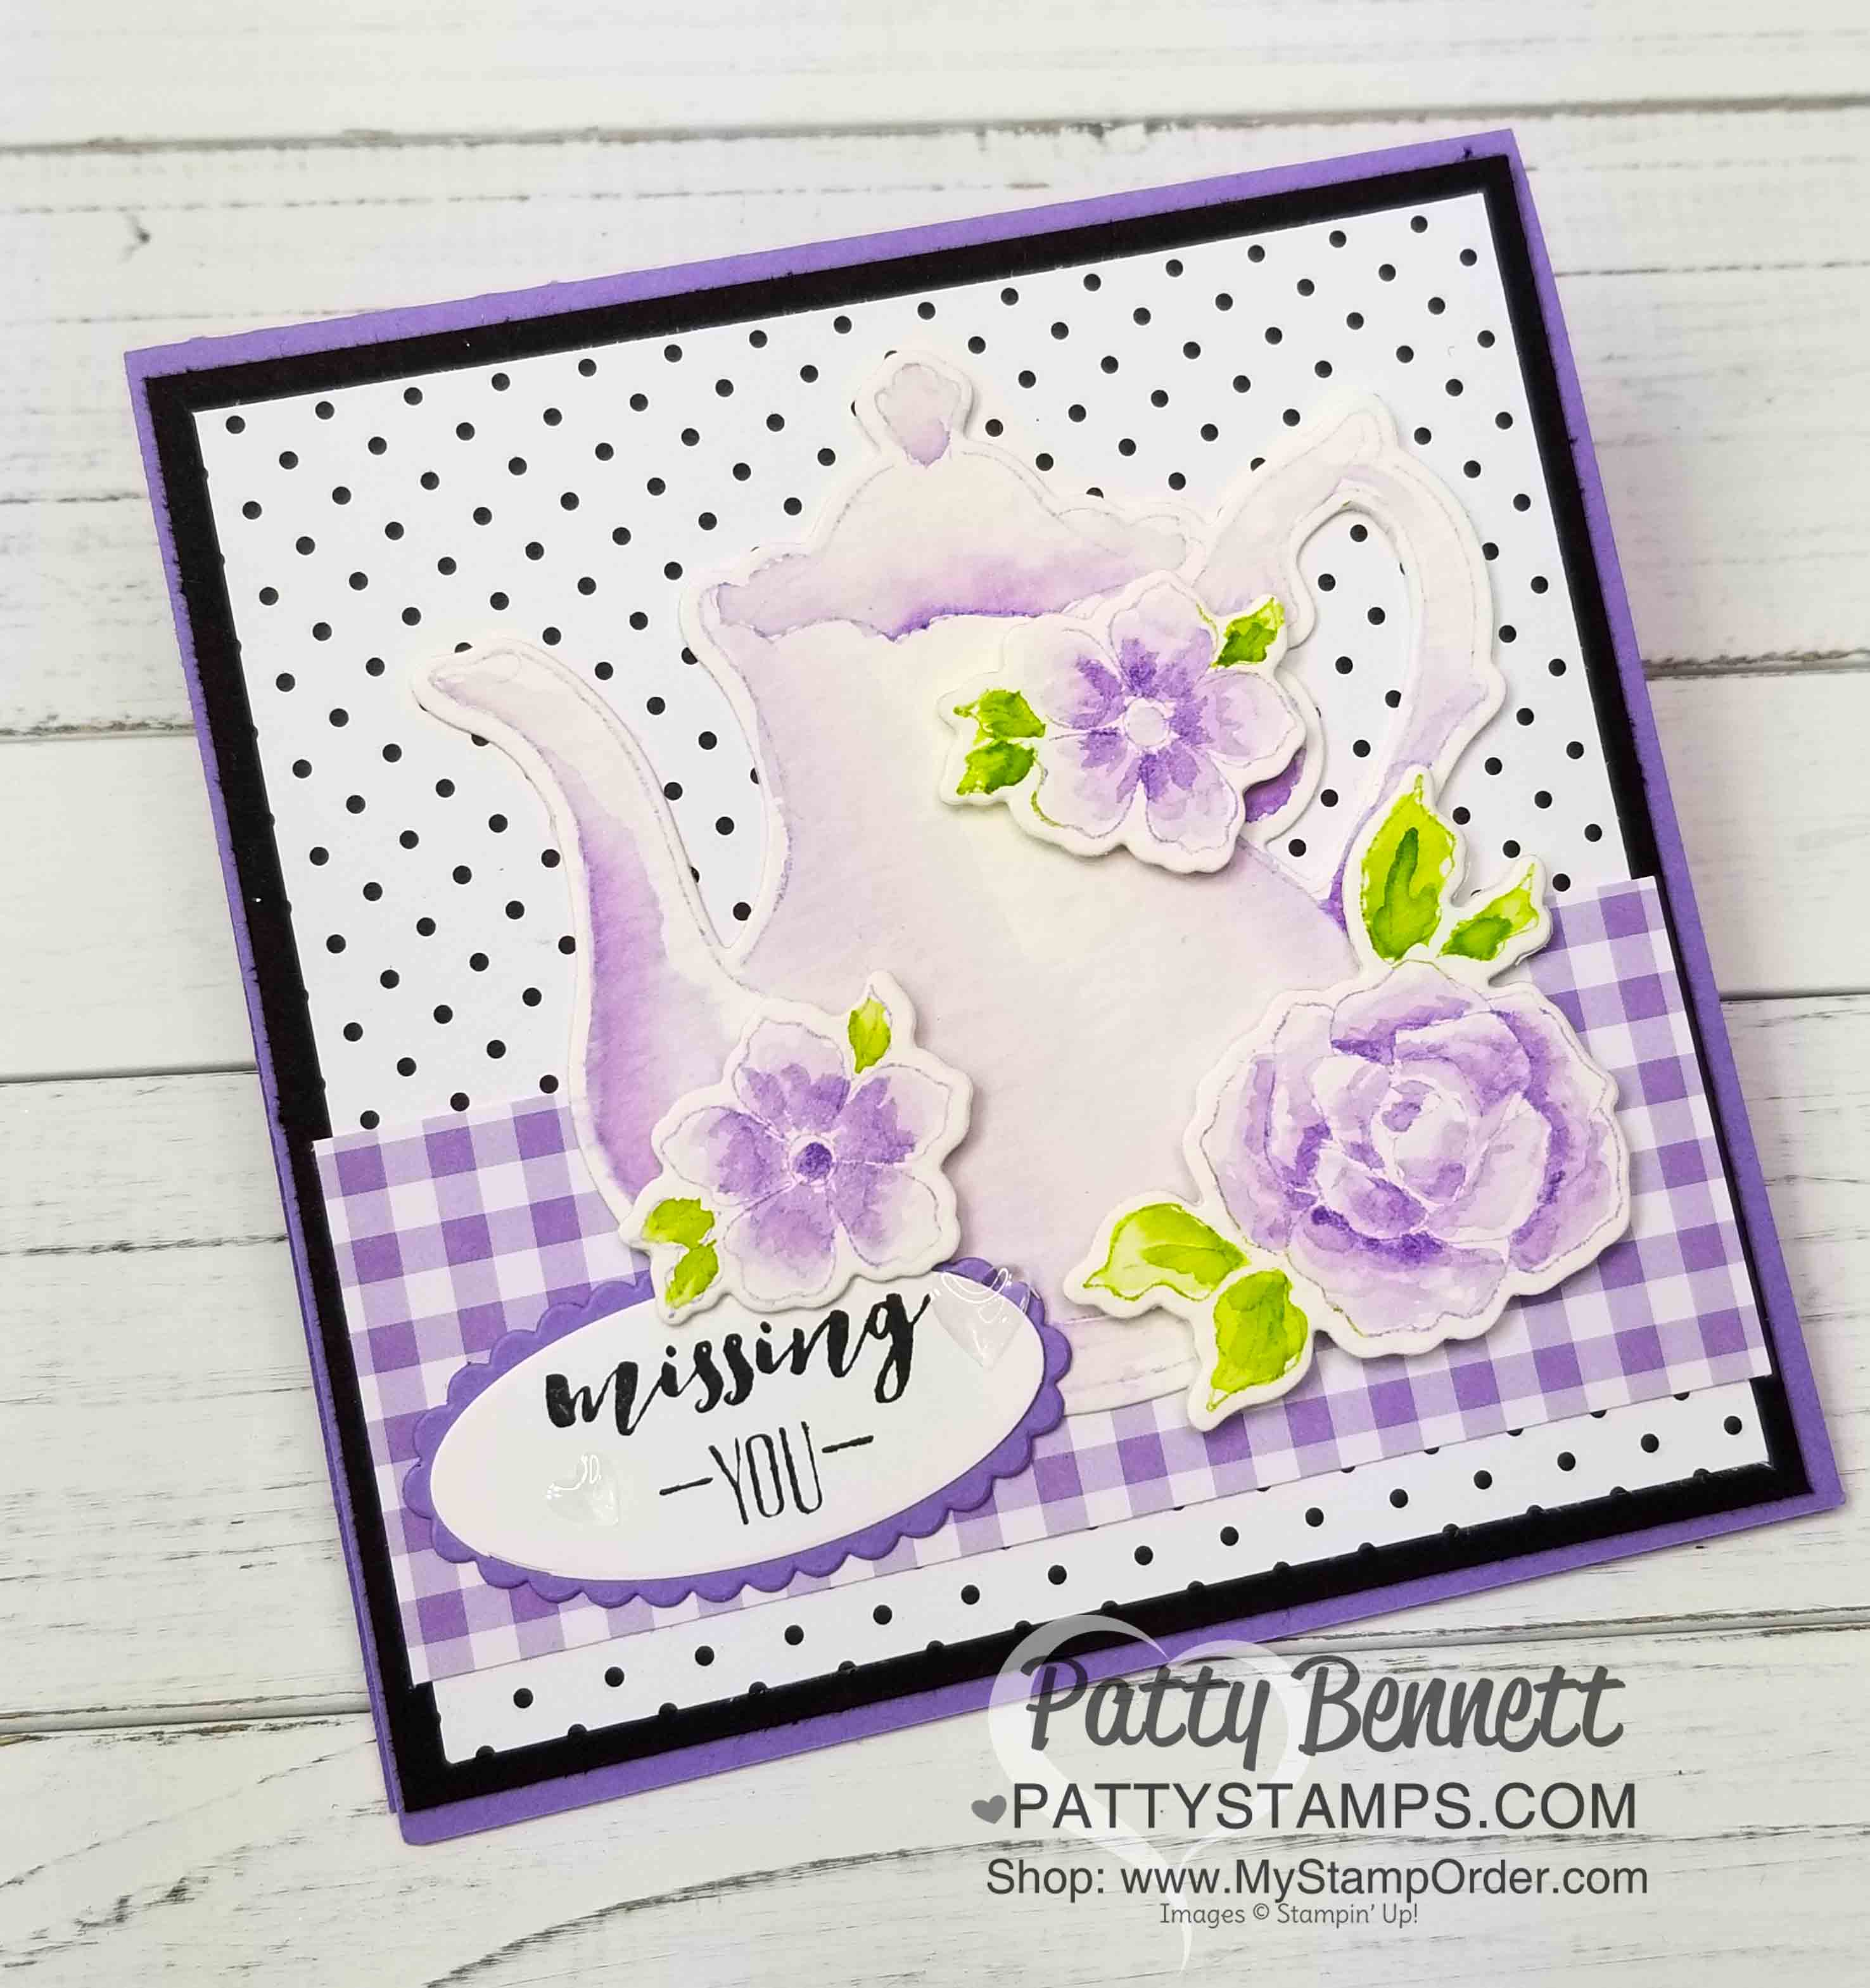 No Line Watercoloring Teapot Card